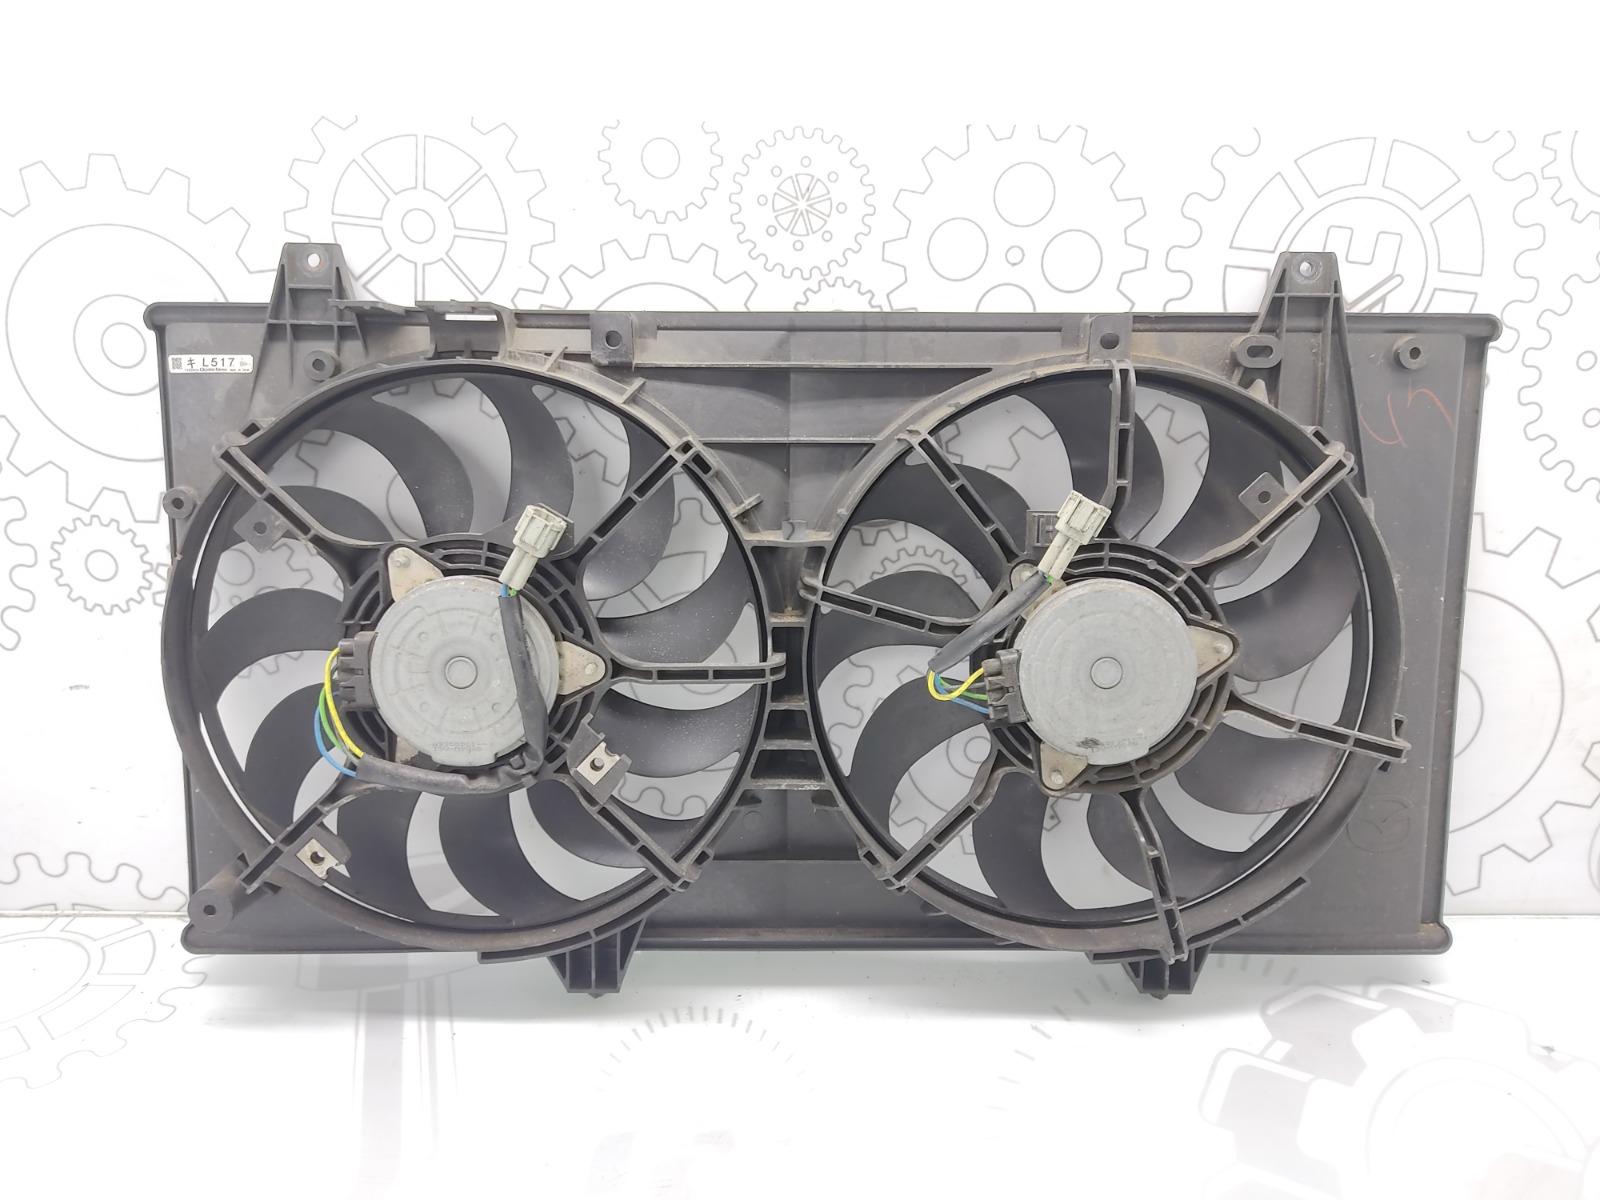 Вентилятор радиатора Mazda 6 2.2 CDTI 2009 (б/у)